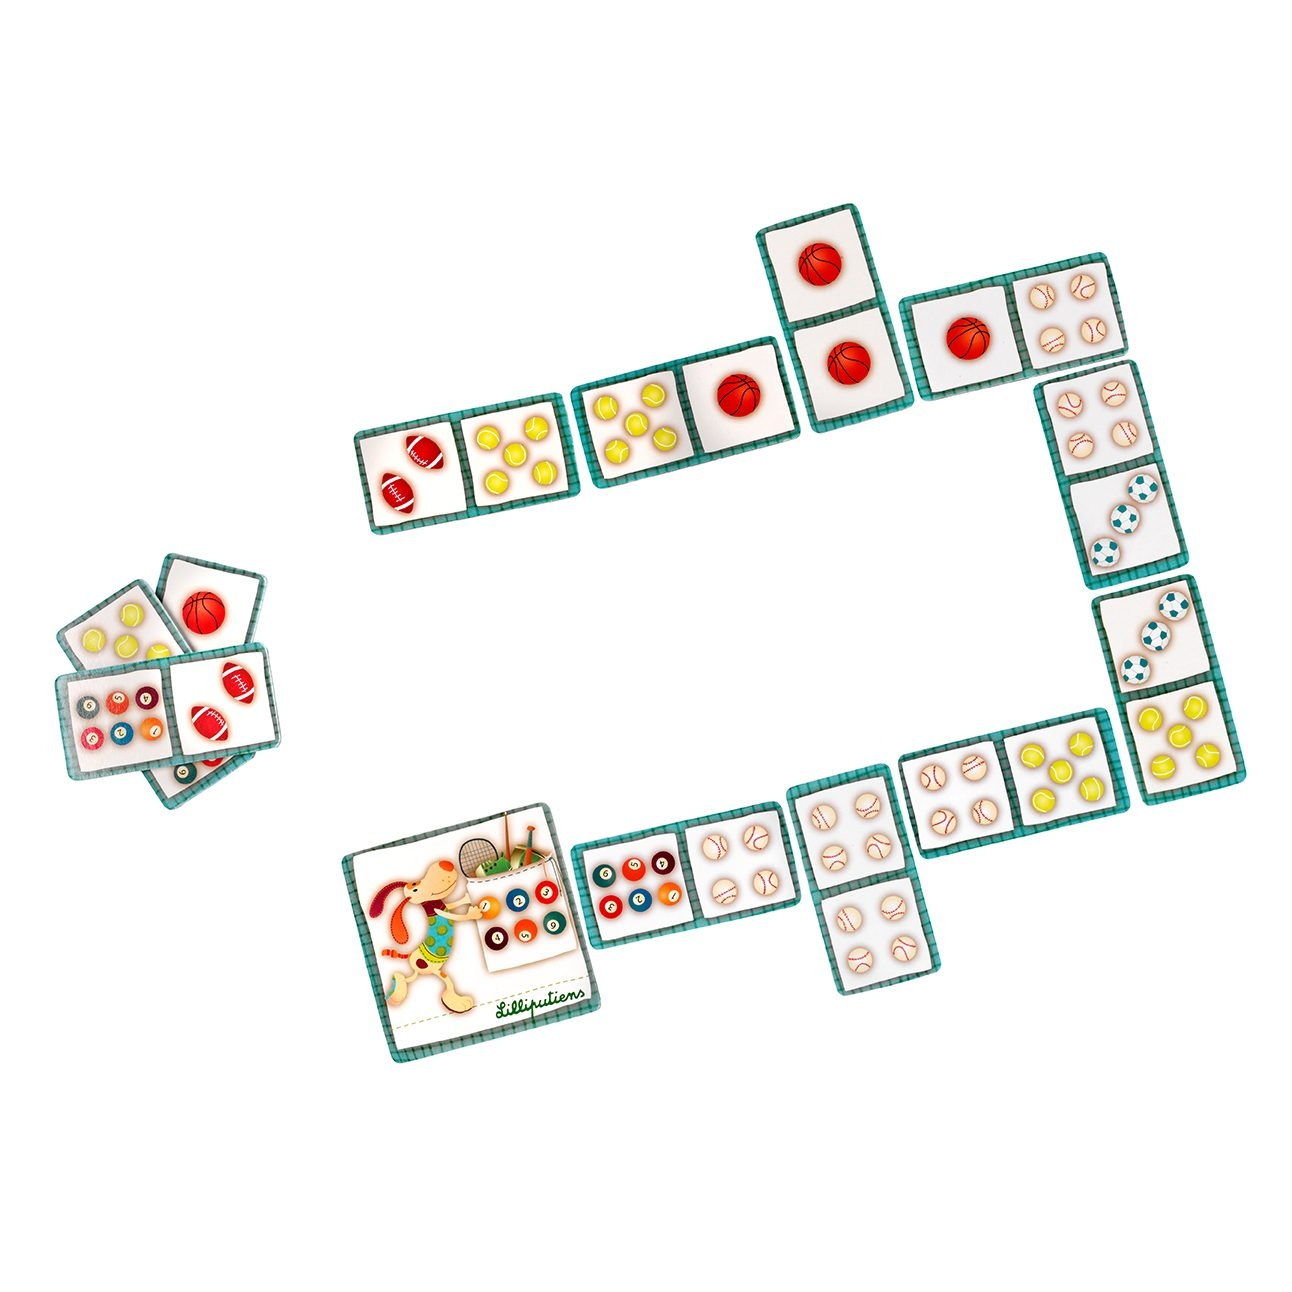 jef-kutyus-2-domino-jatek